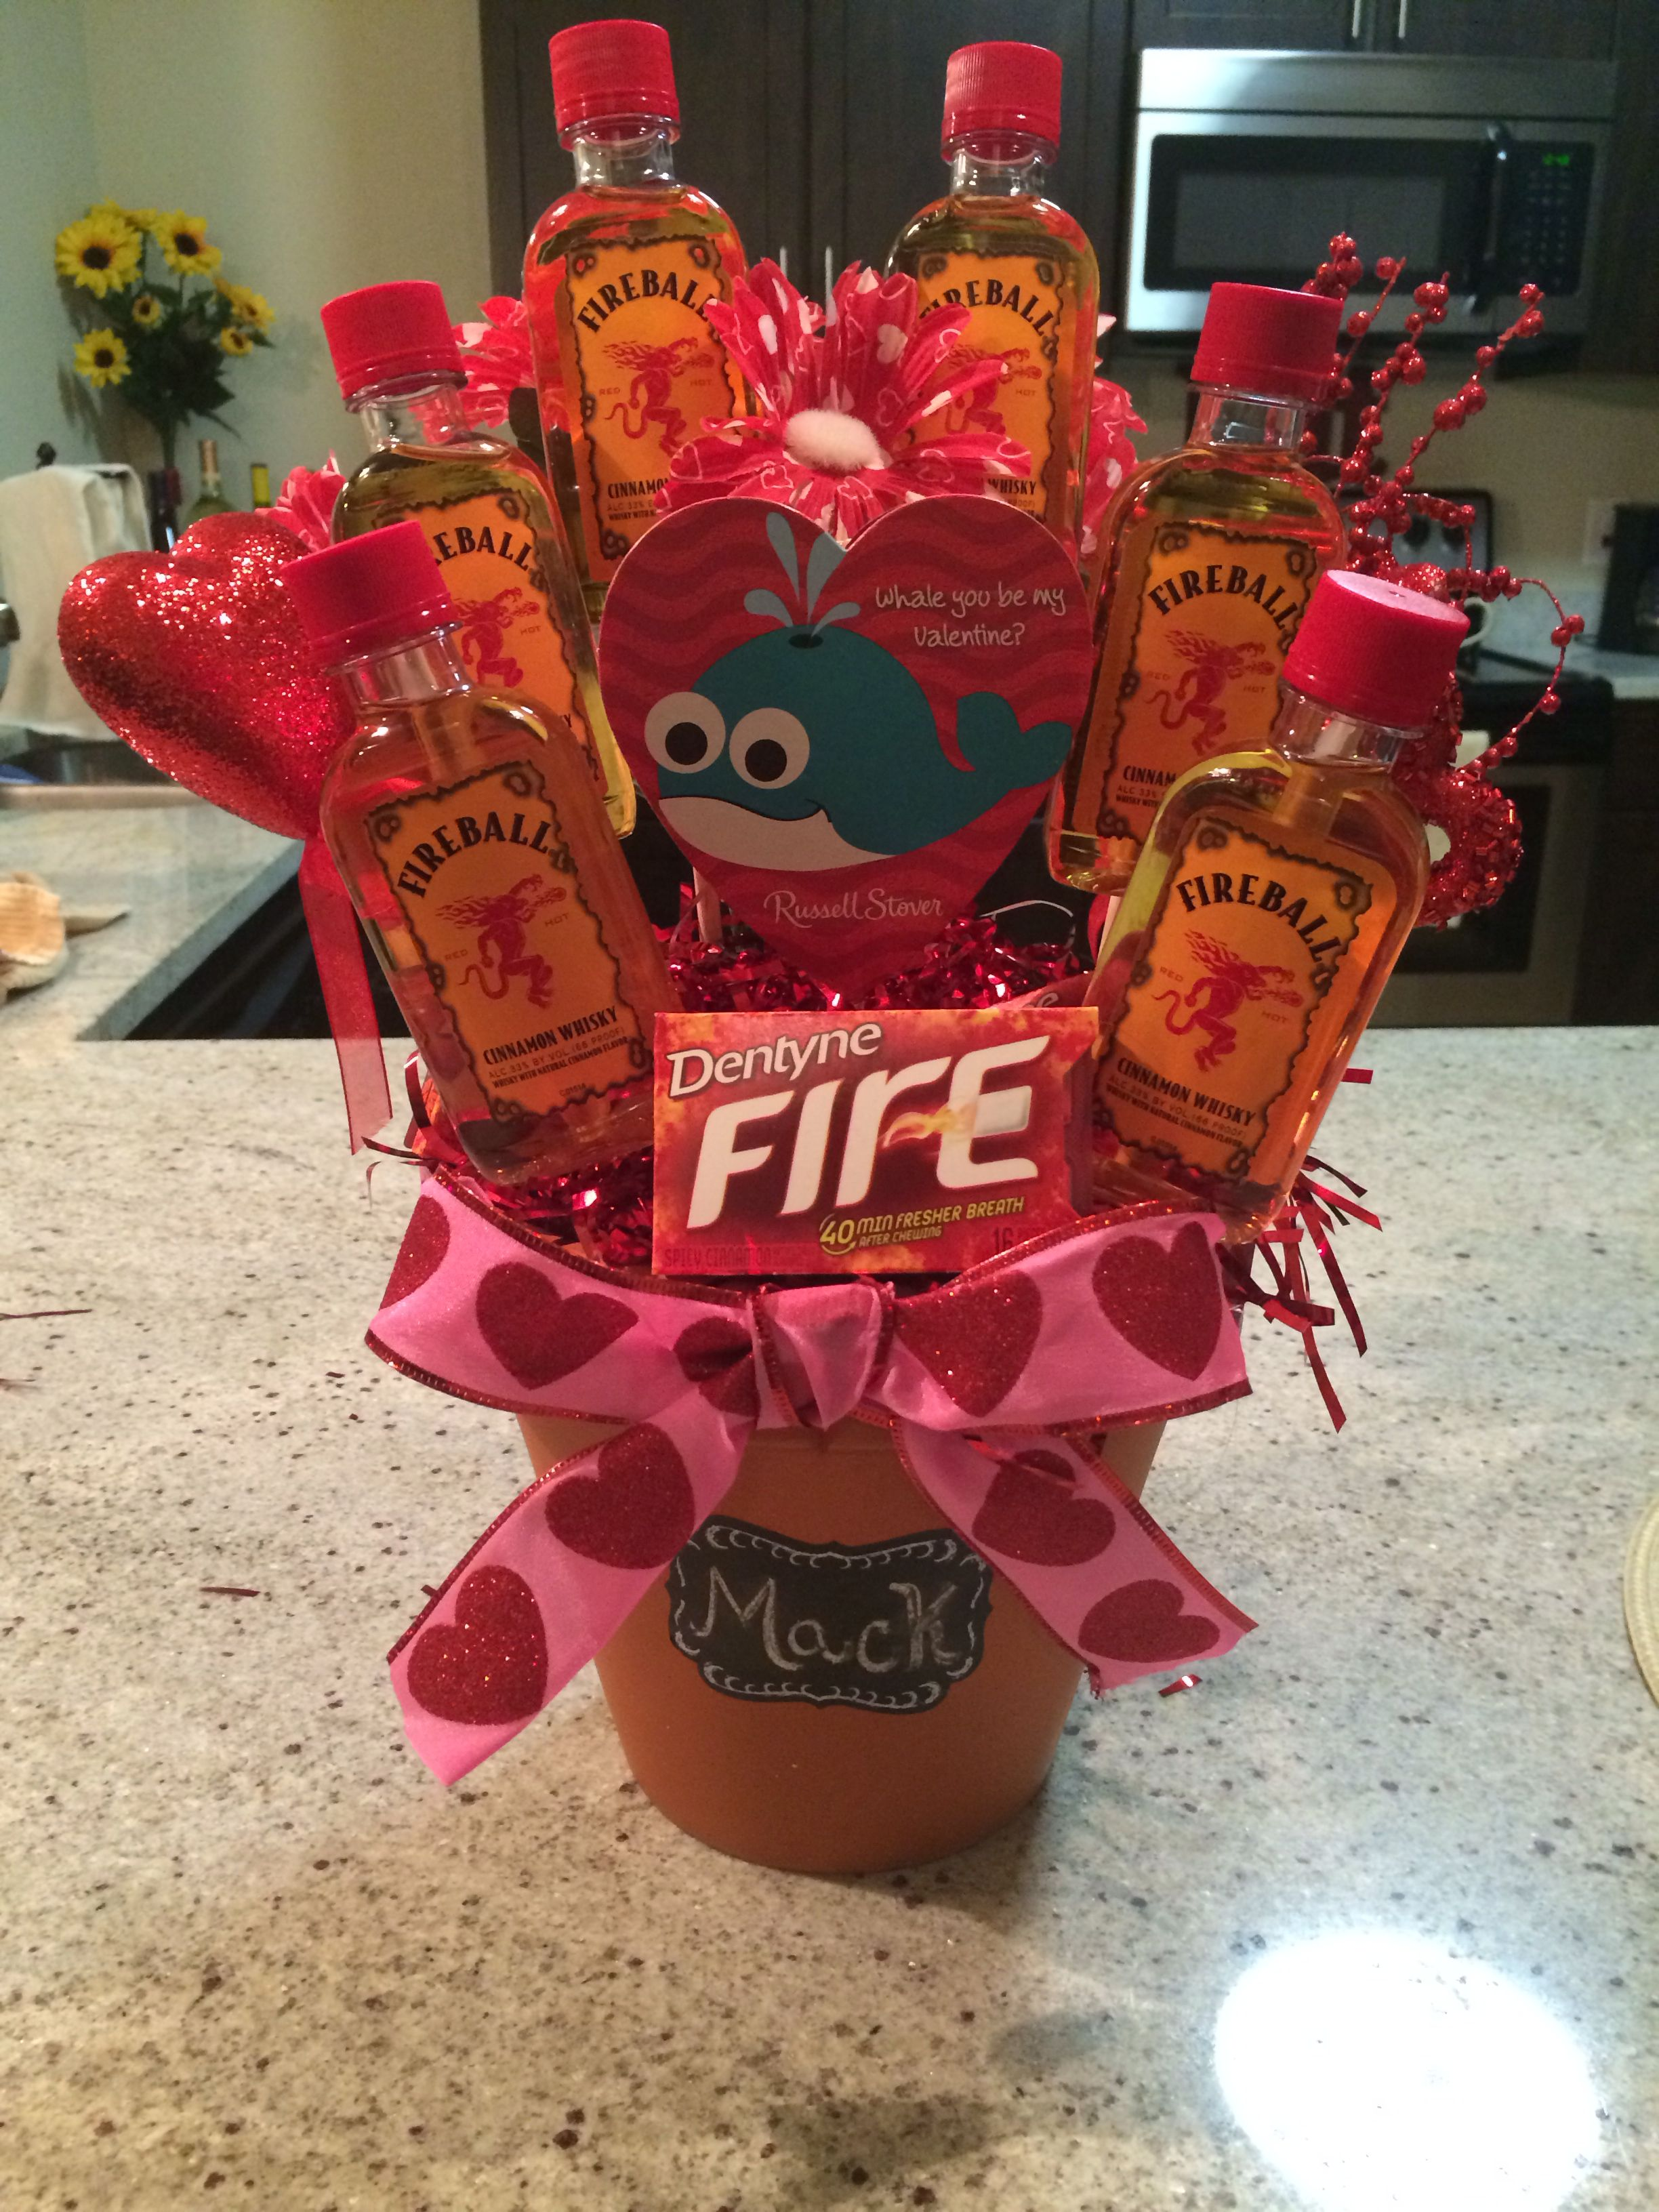 Fireball Liquor Bouquet For Valentine S Day Crafts Diy